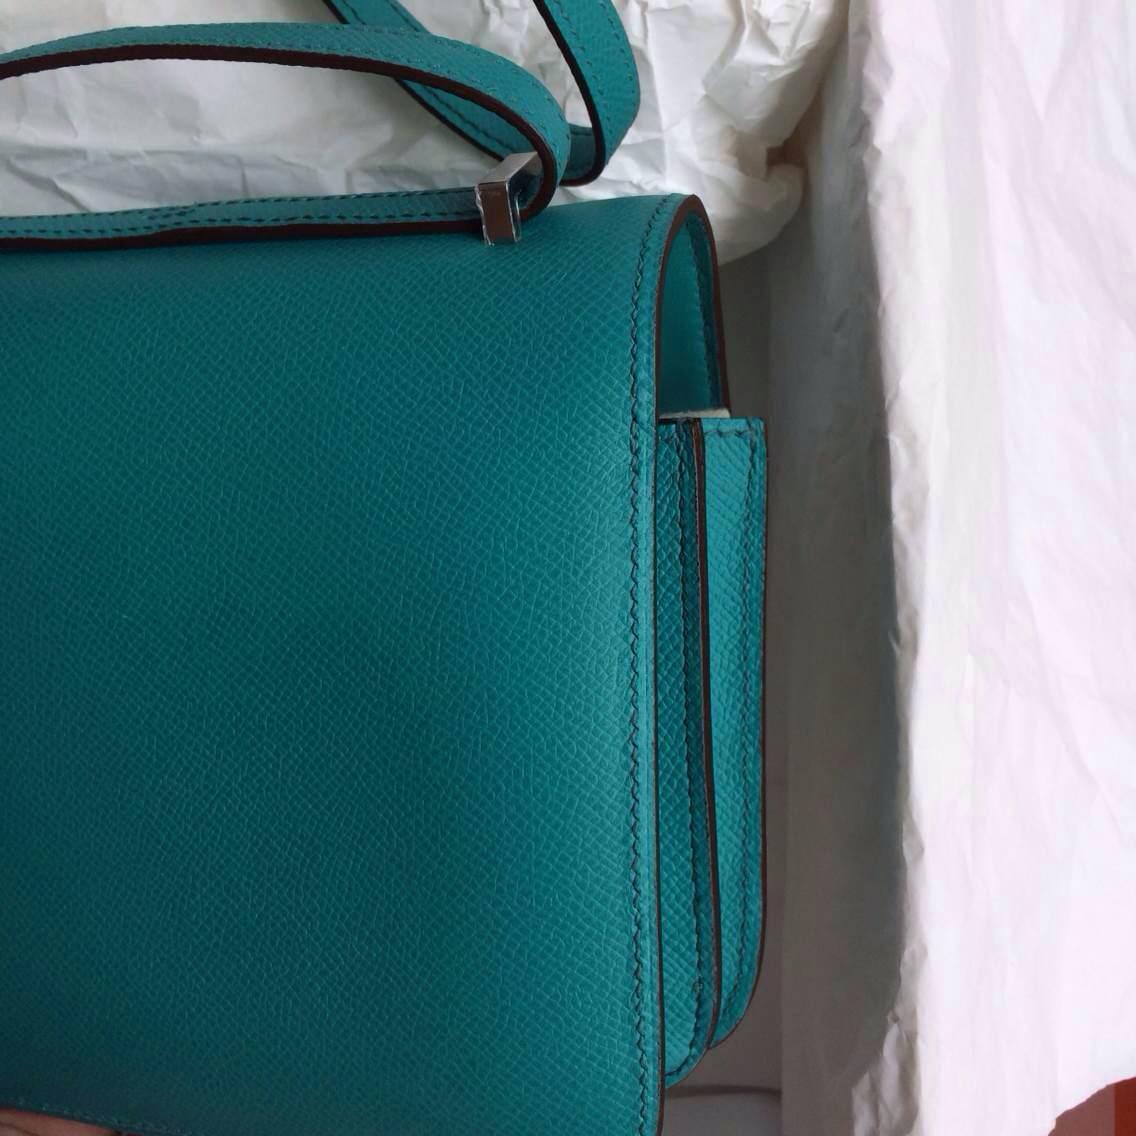 Hand Stitching Hermes Constance Bag 26cm 7F Lagon Color France Epsom Leather